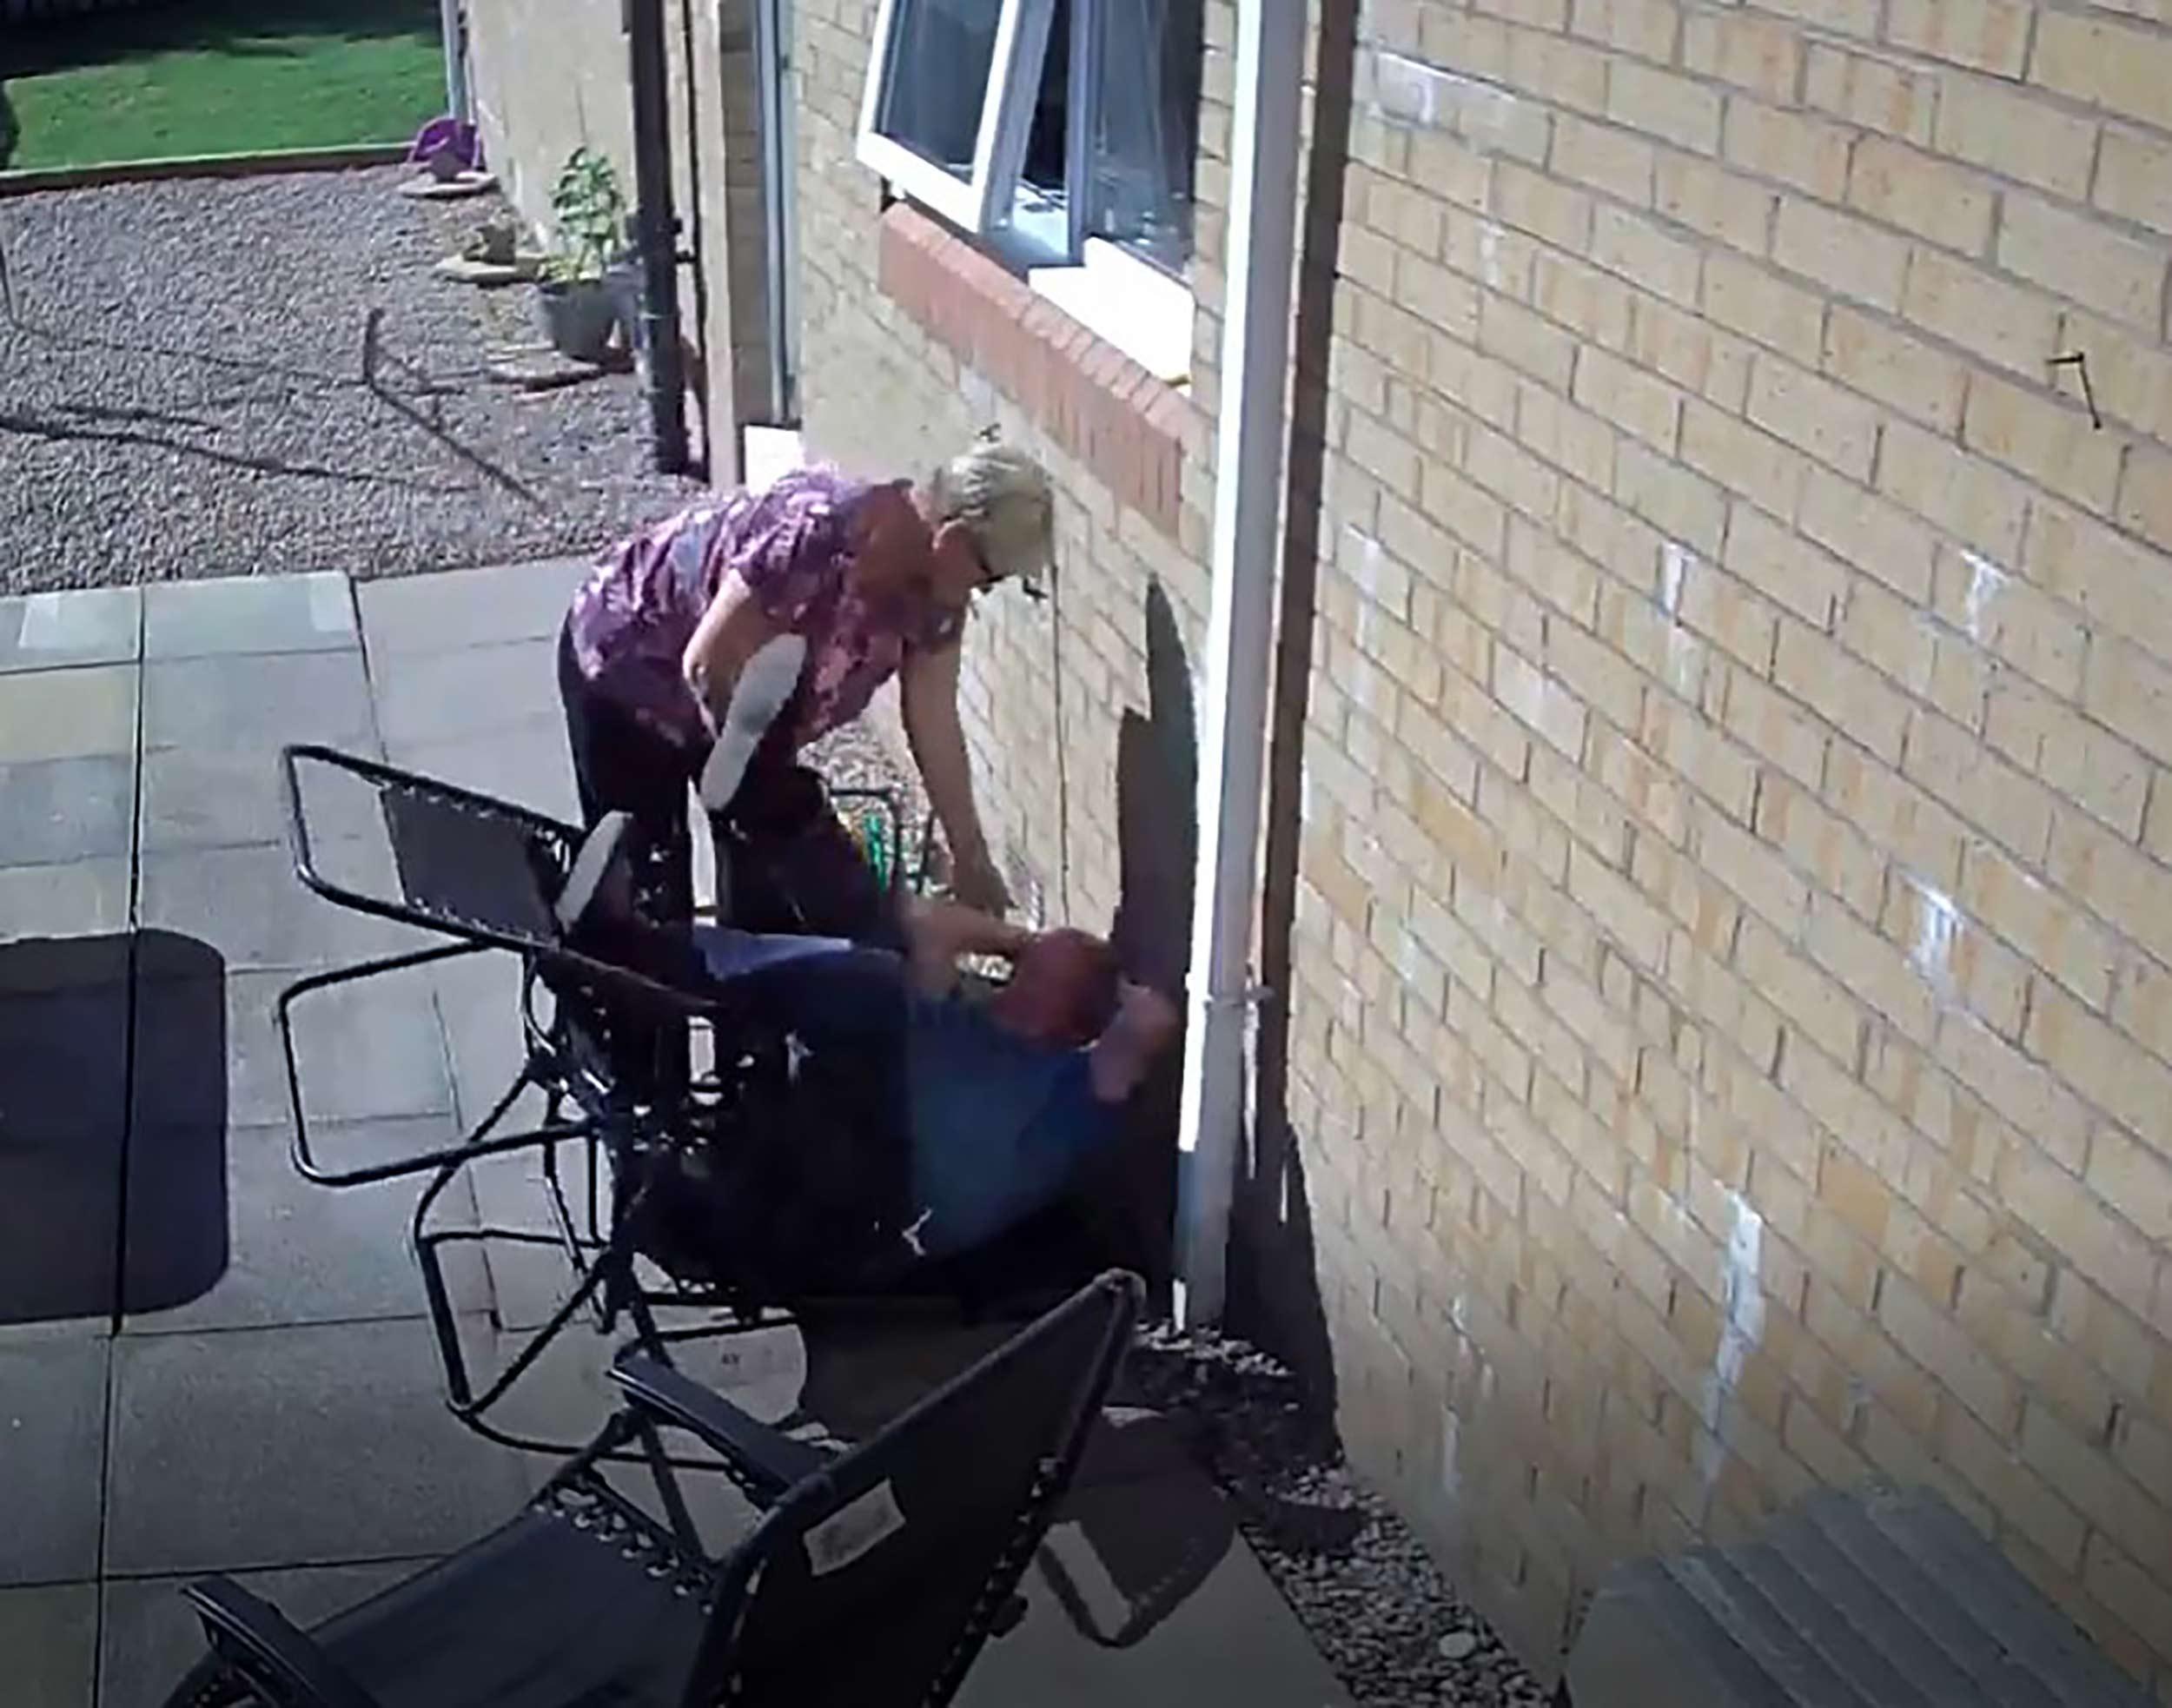 Glenn Smith Deckchair - Viral News Scotland